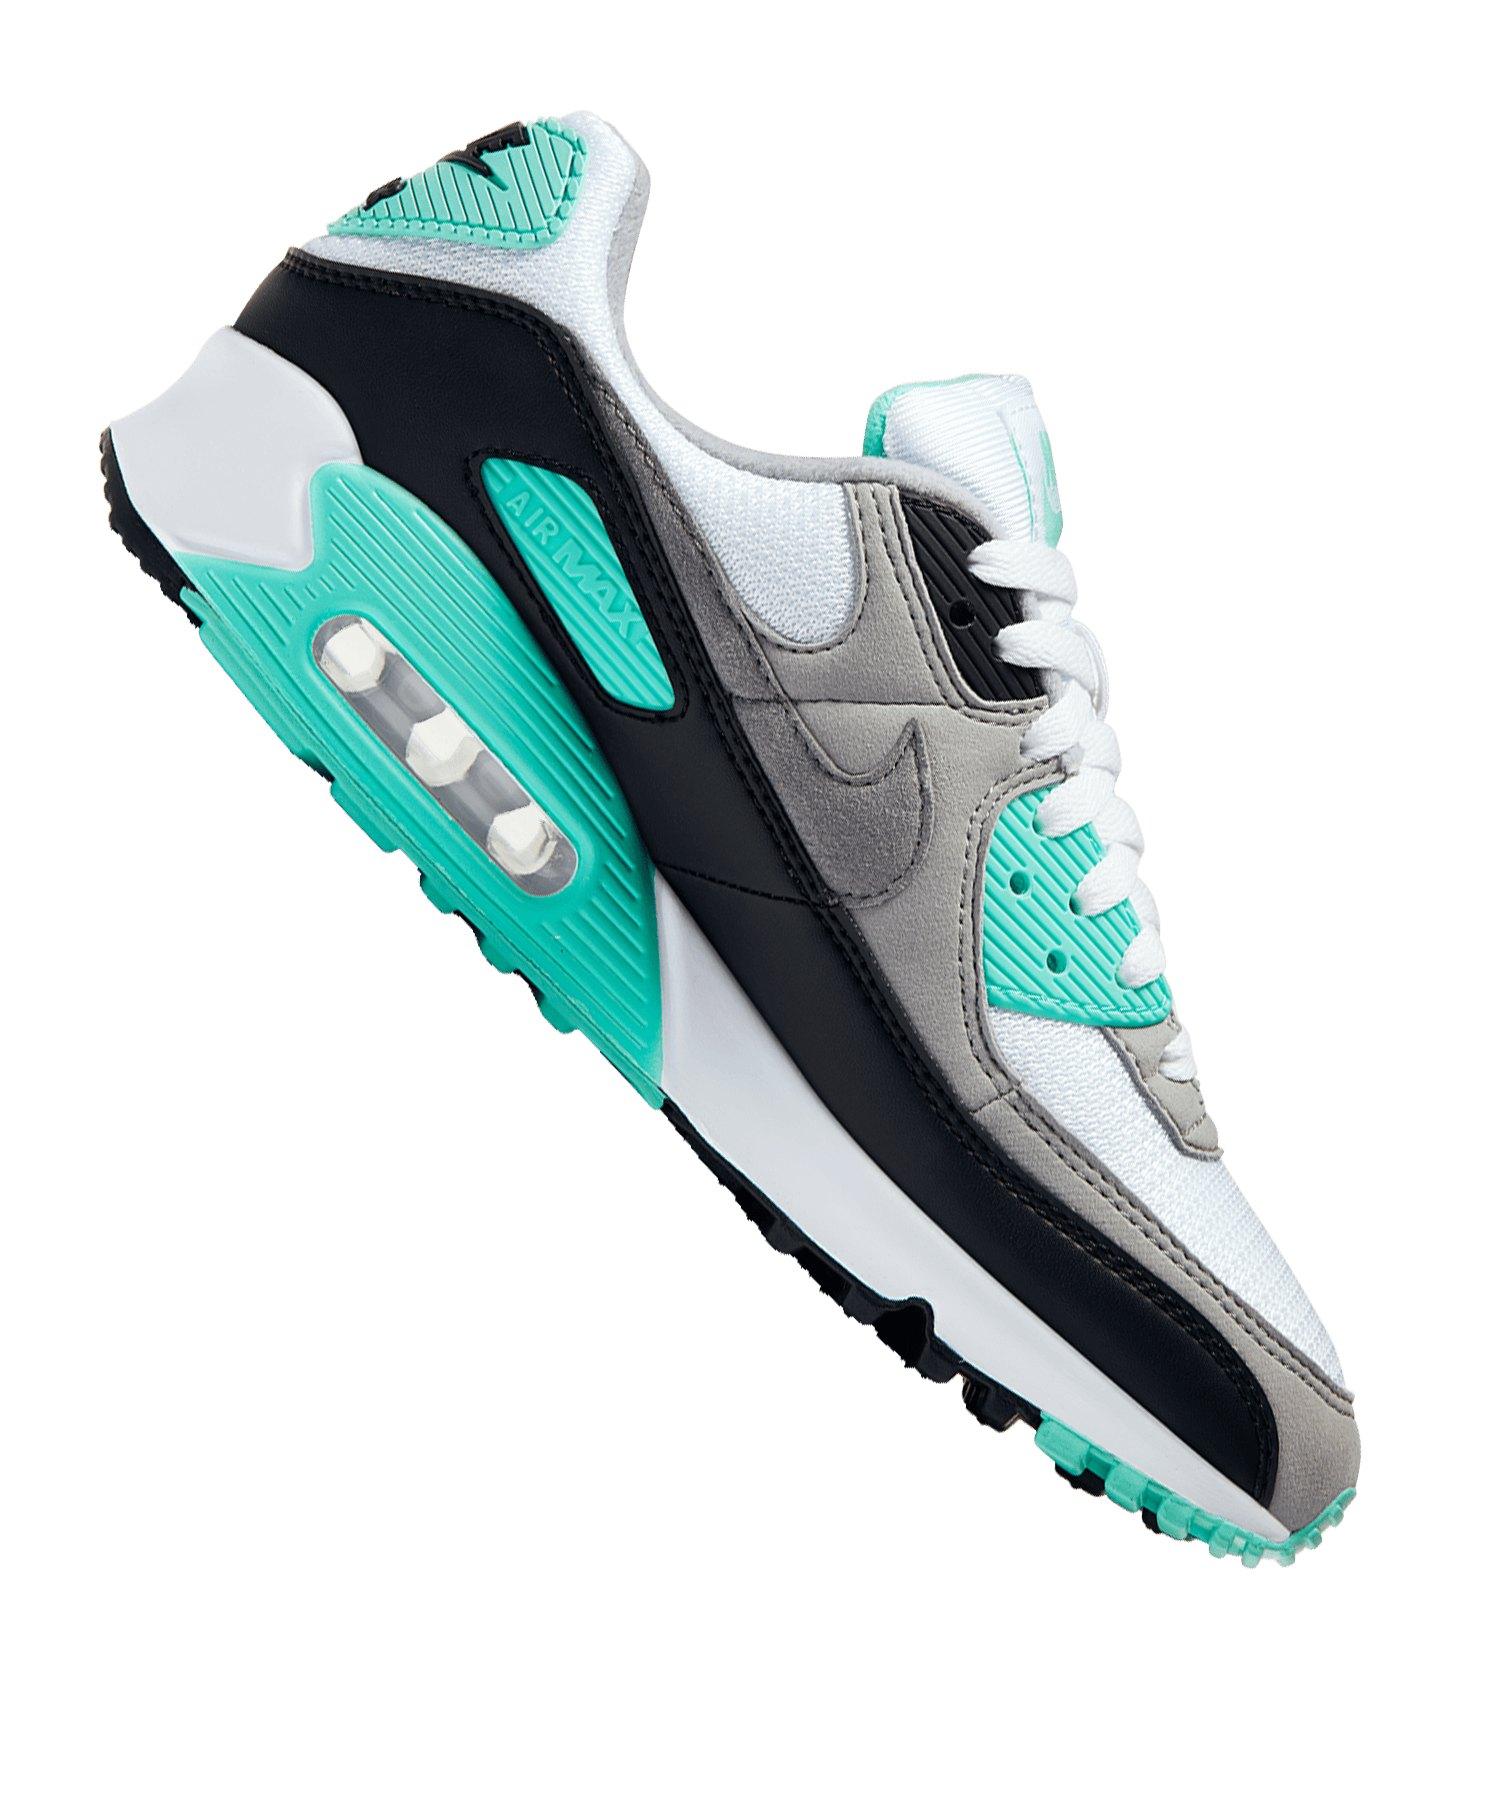 STREETWEAR SOURCE | Schuhe damen, Nike schuhe und Schuhe